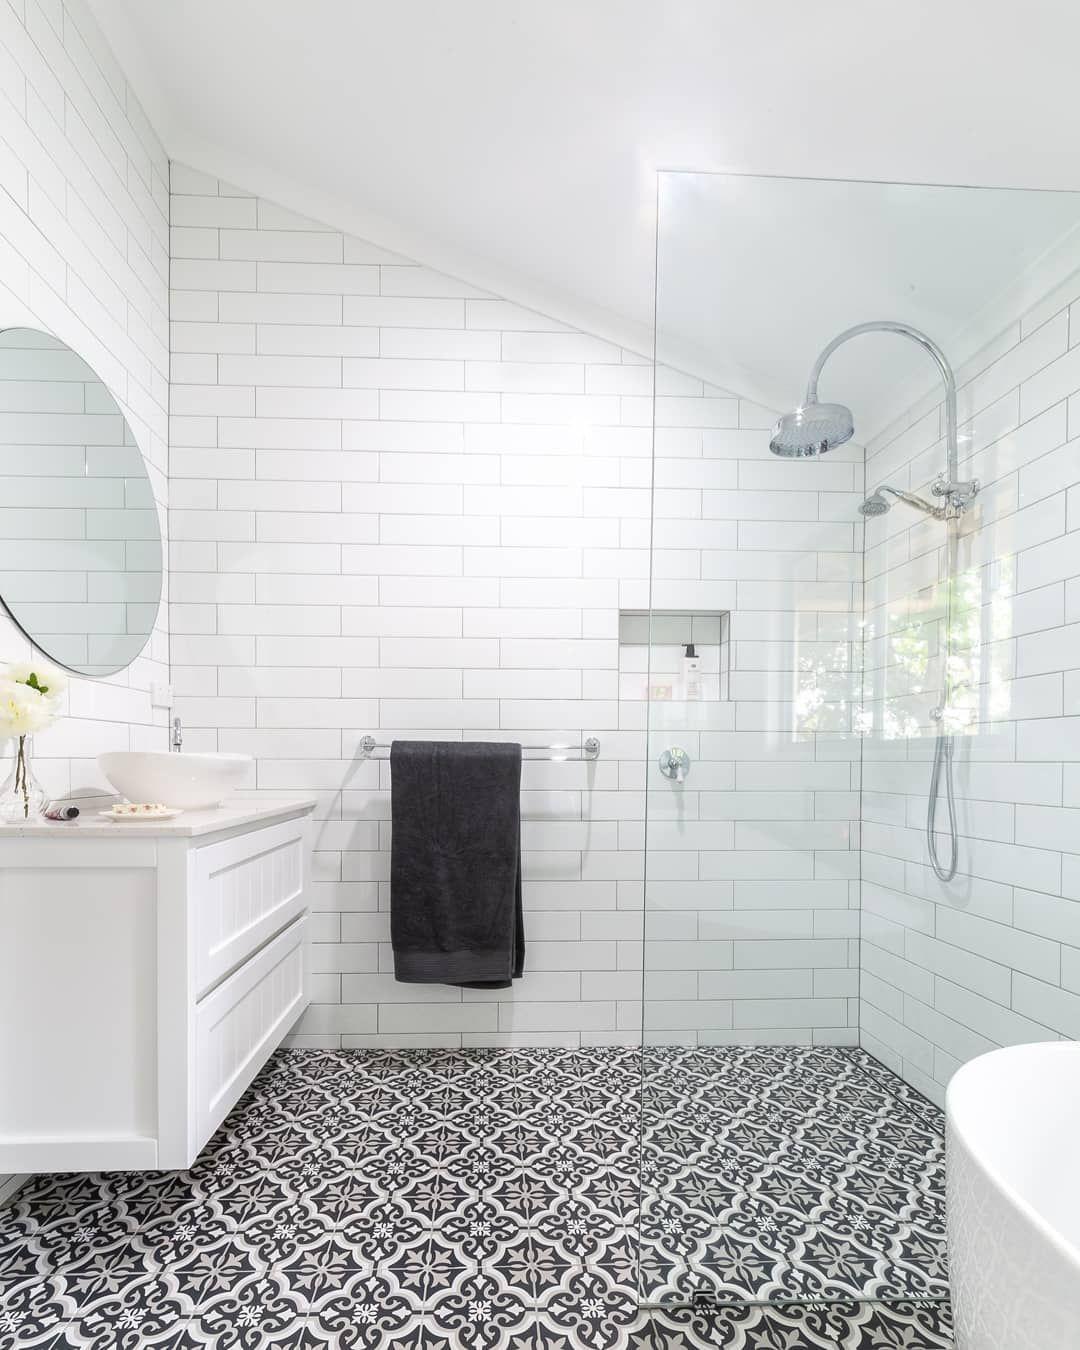 nr bathroom renovations on instagram u201cthis farmhouse bathroom was rh pinterest com